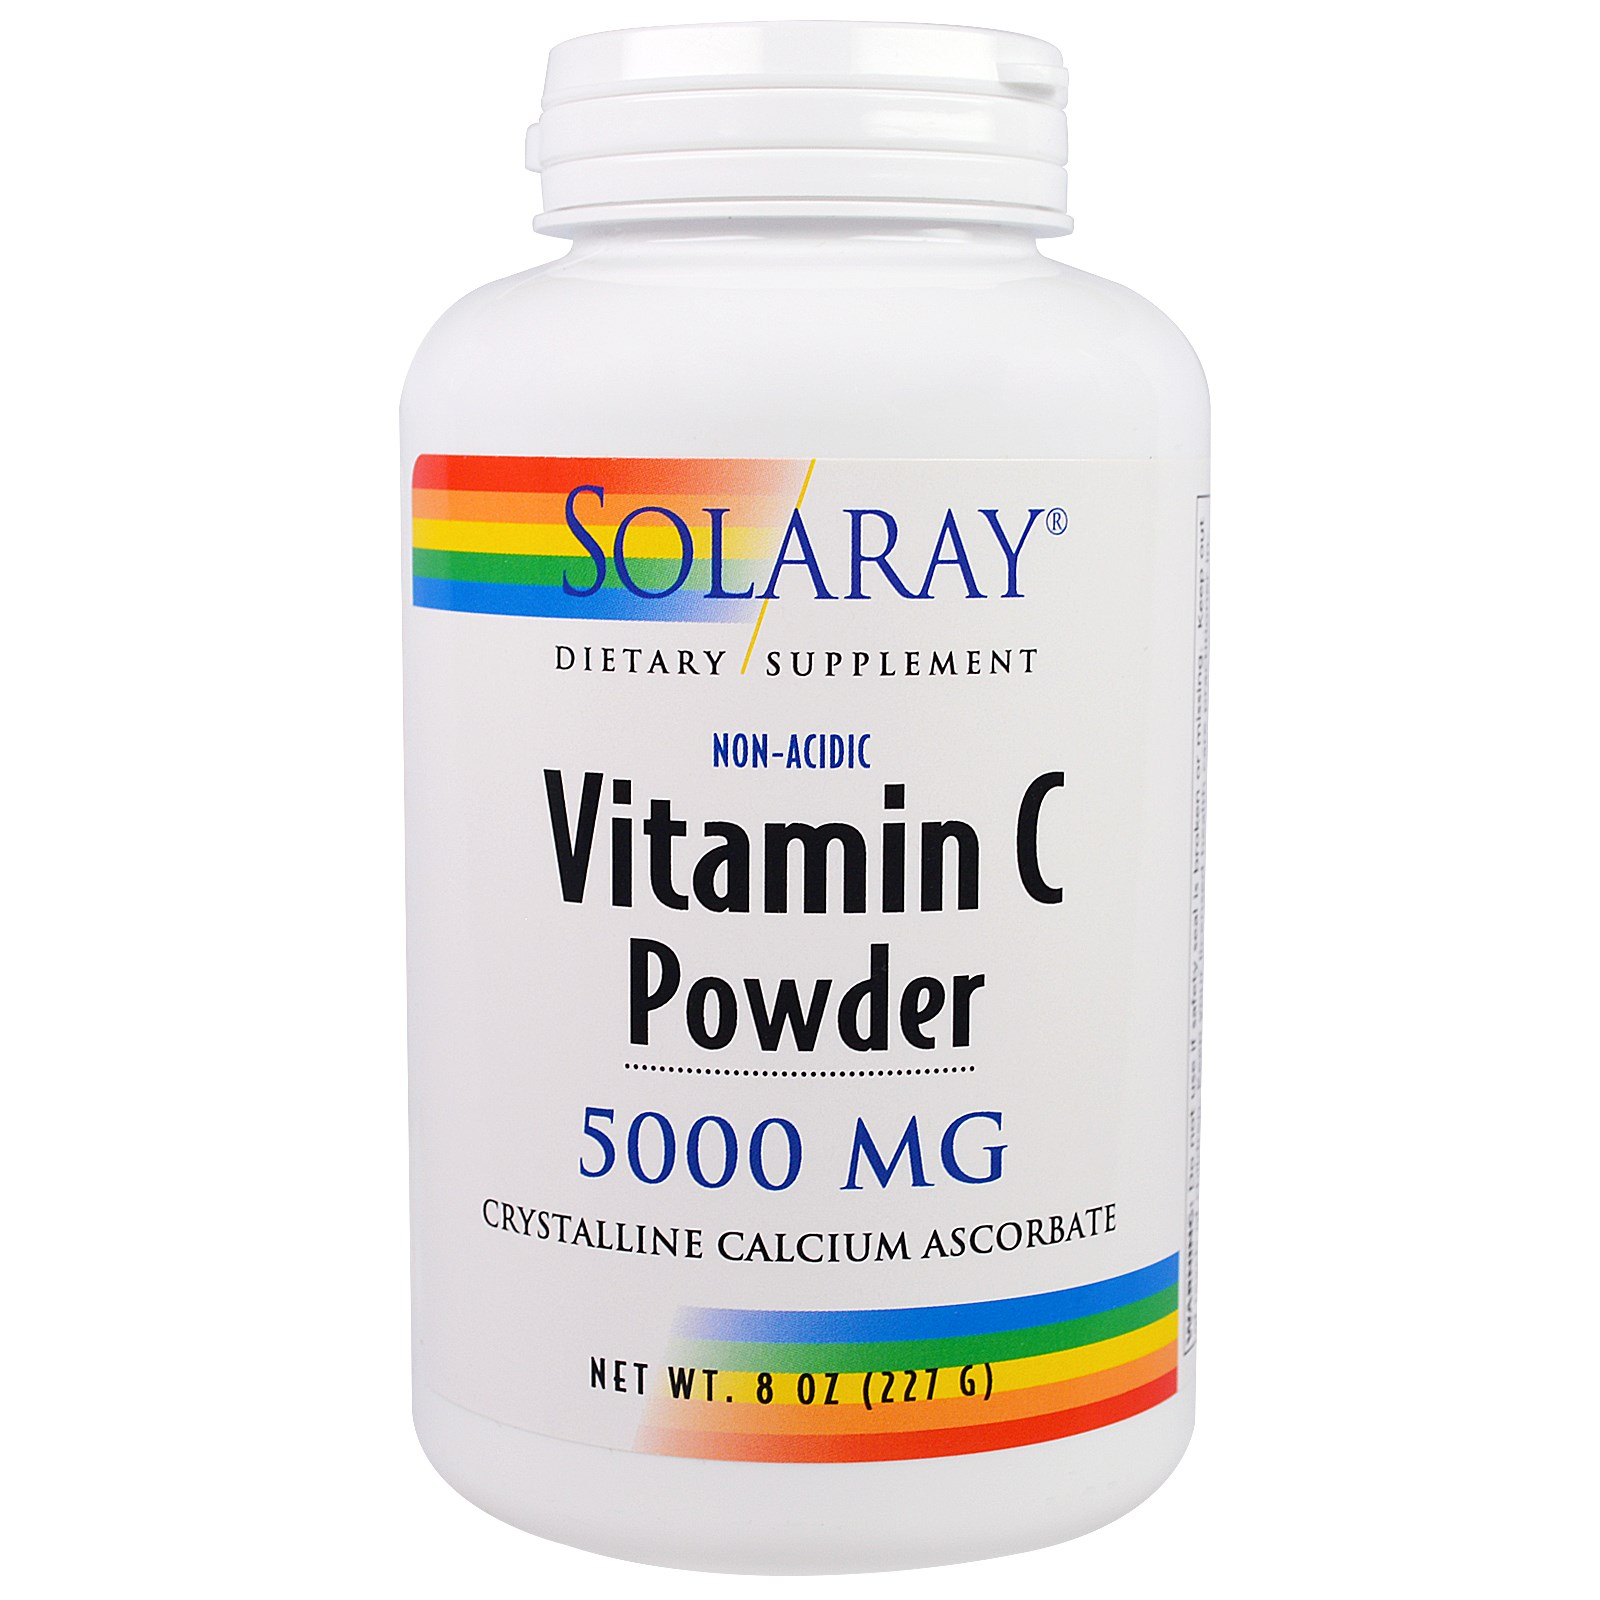 Solaray, Vitamin C Powder, 5,000 mg, 8 oz (227 g) - iHerb.com